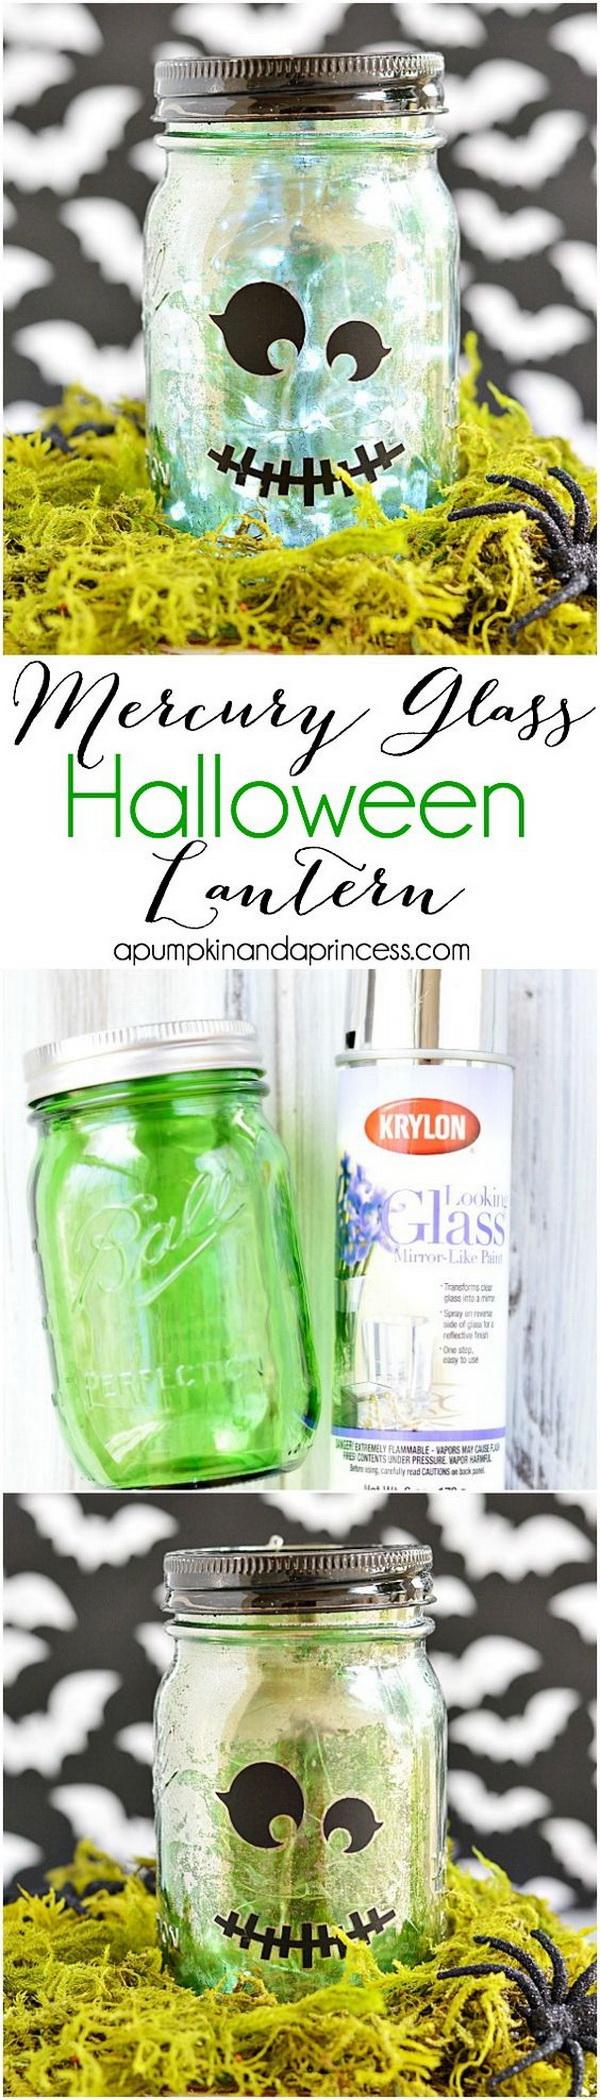 Mercury Glass Halloween Mason Jar.